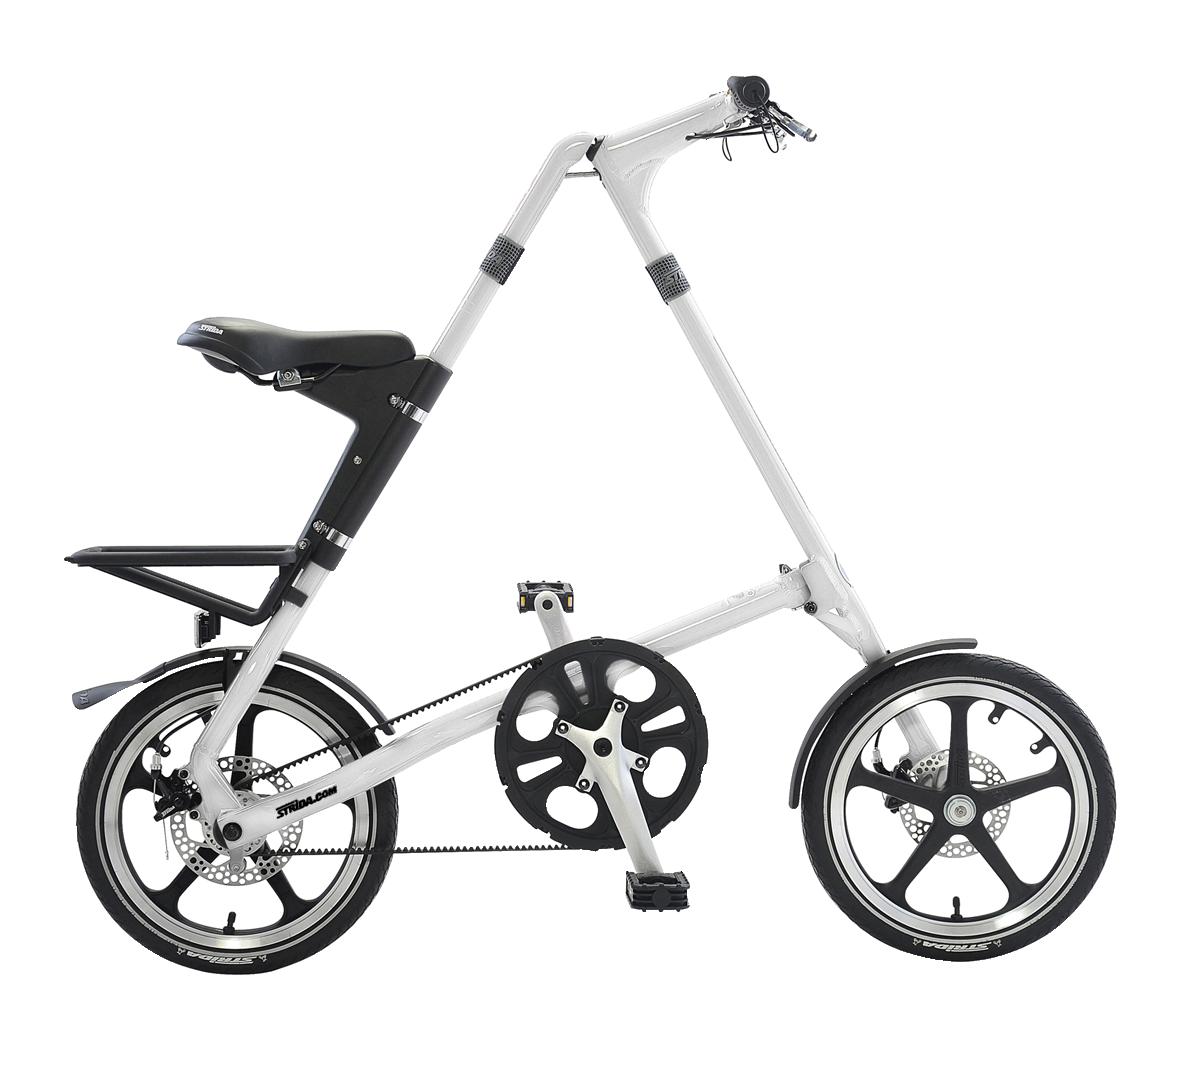 STRiDA LT Folding Bicycle, White-0